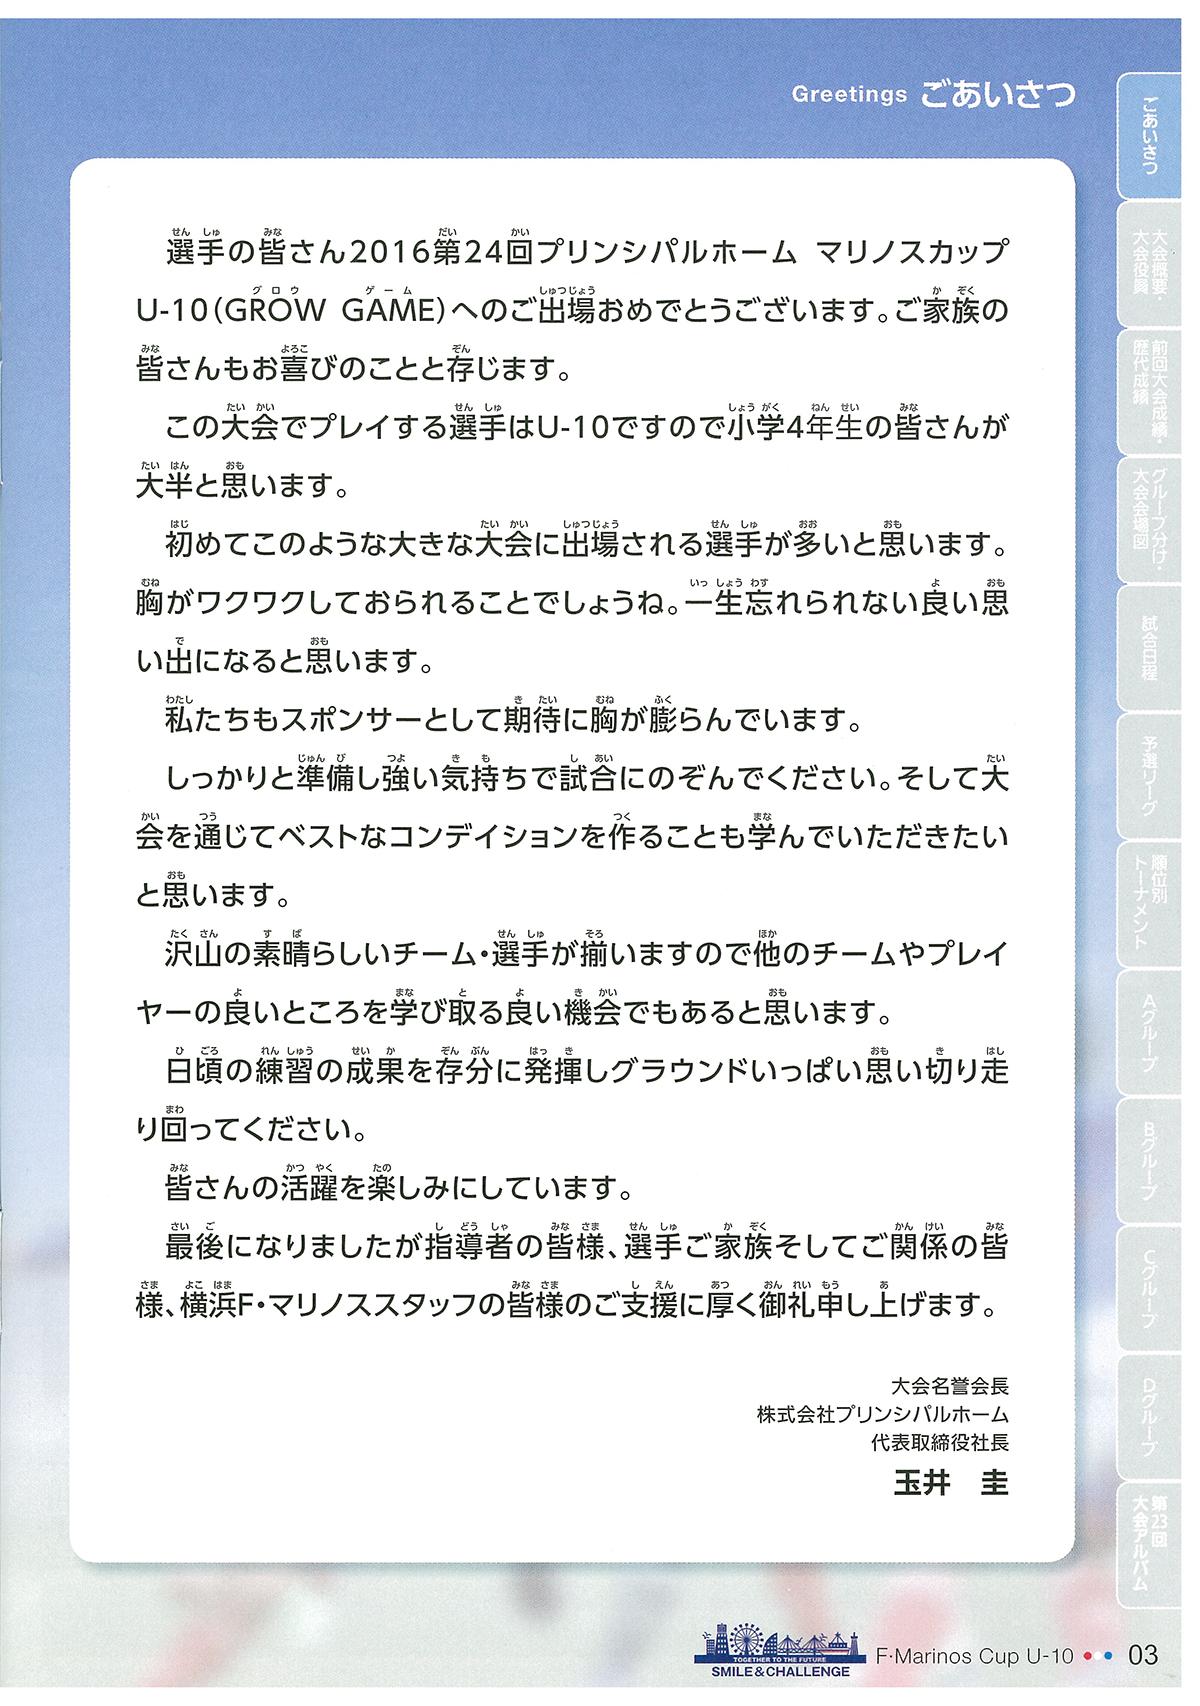 img-Z23181458-2 第24回プリンシパルホームF・Marinos CUP U-10 GROWGAME 開催のお知らせ